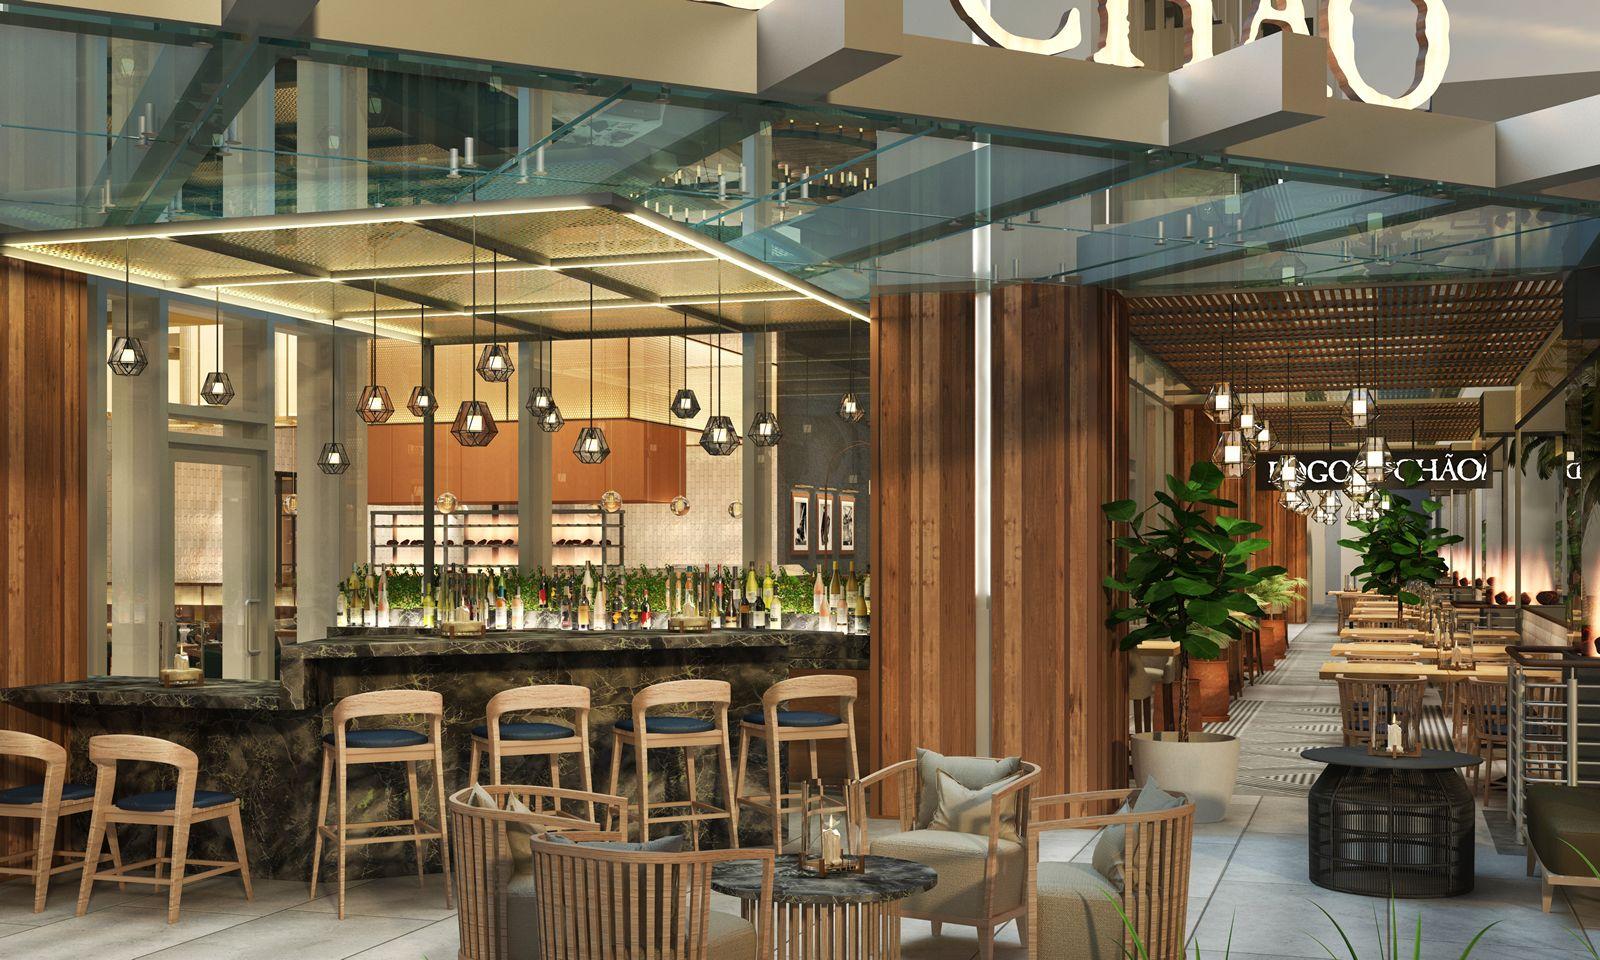 Harrison Partners with Fogo de Chão to Design Fort Lauderdale Restaurant